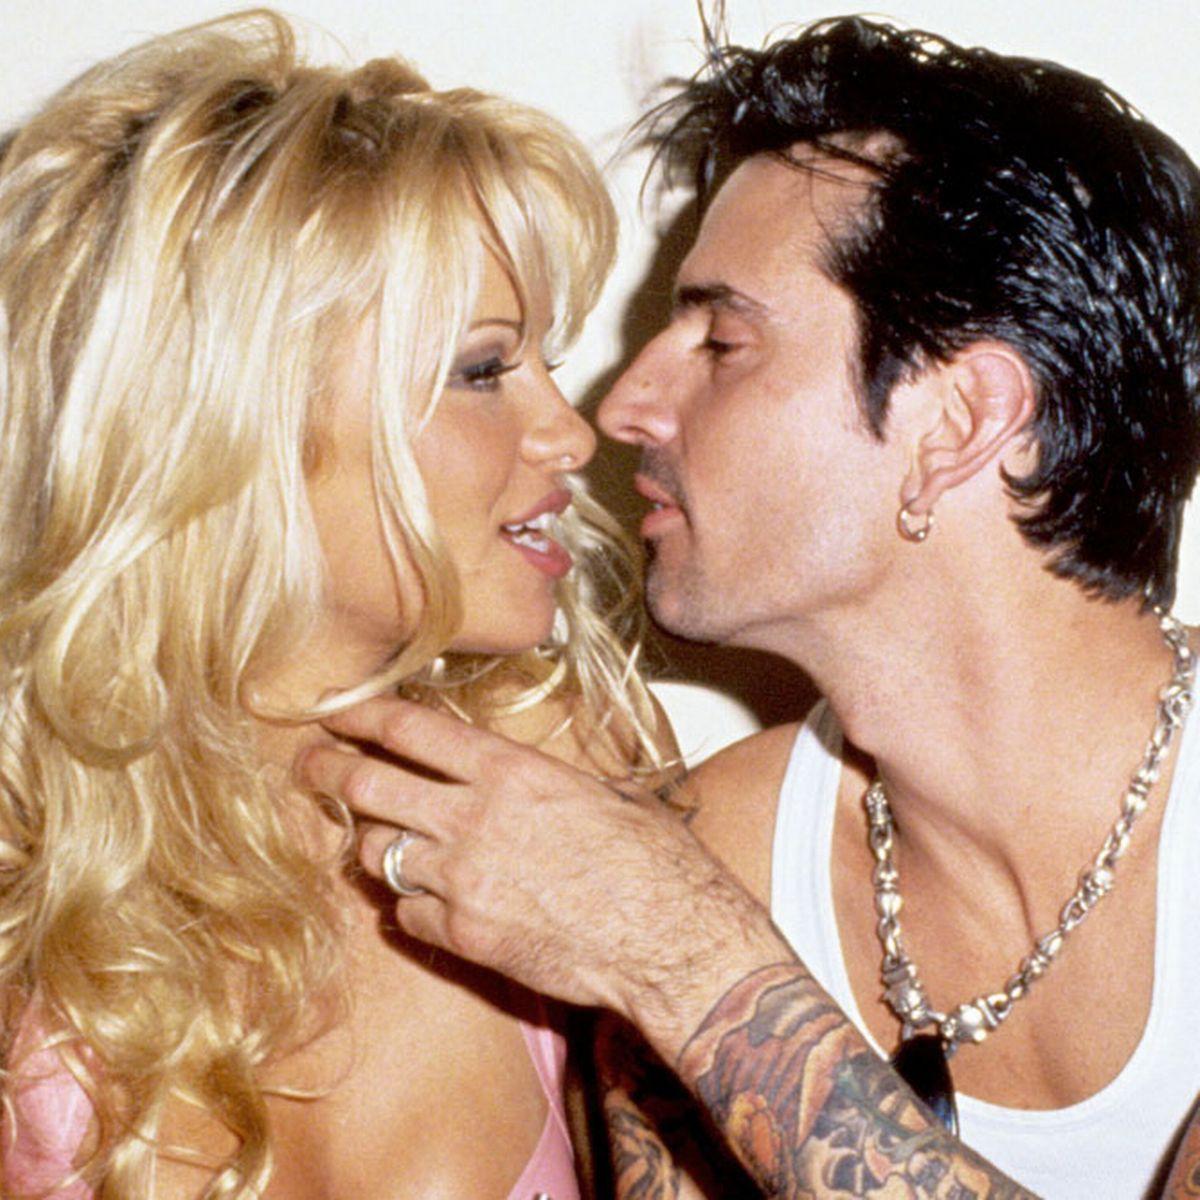 Pamela Anderson Video Tape photo 1